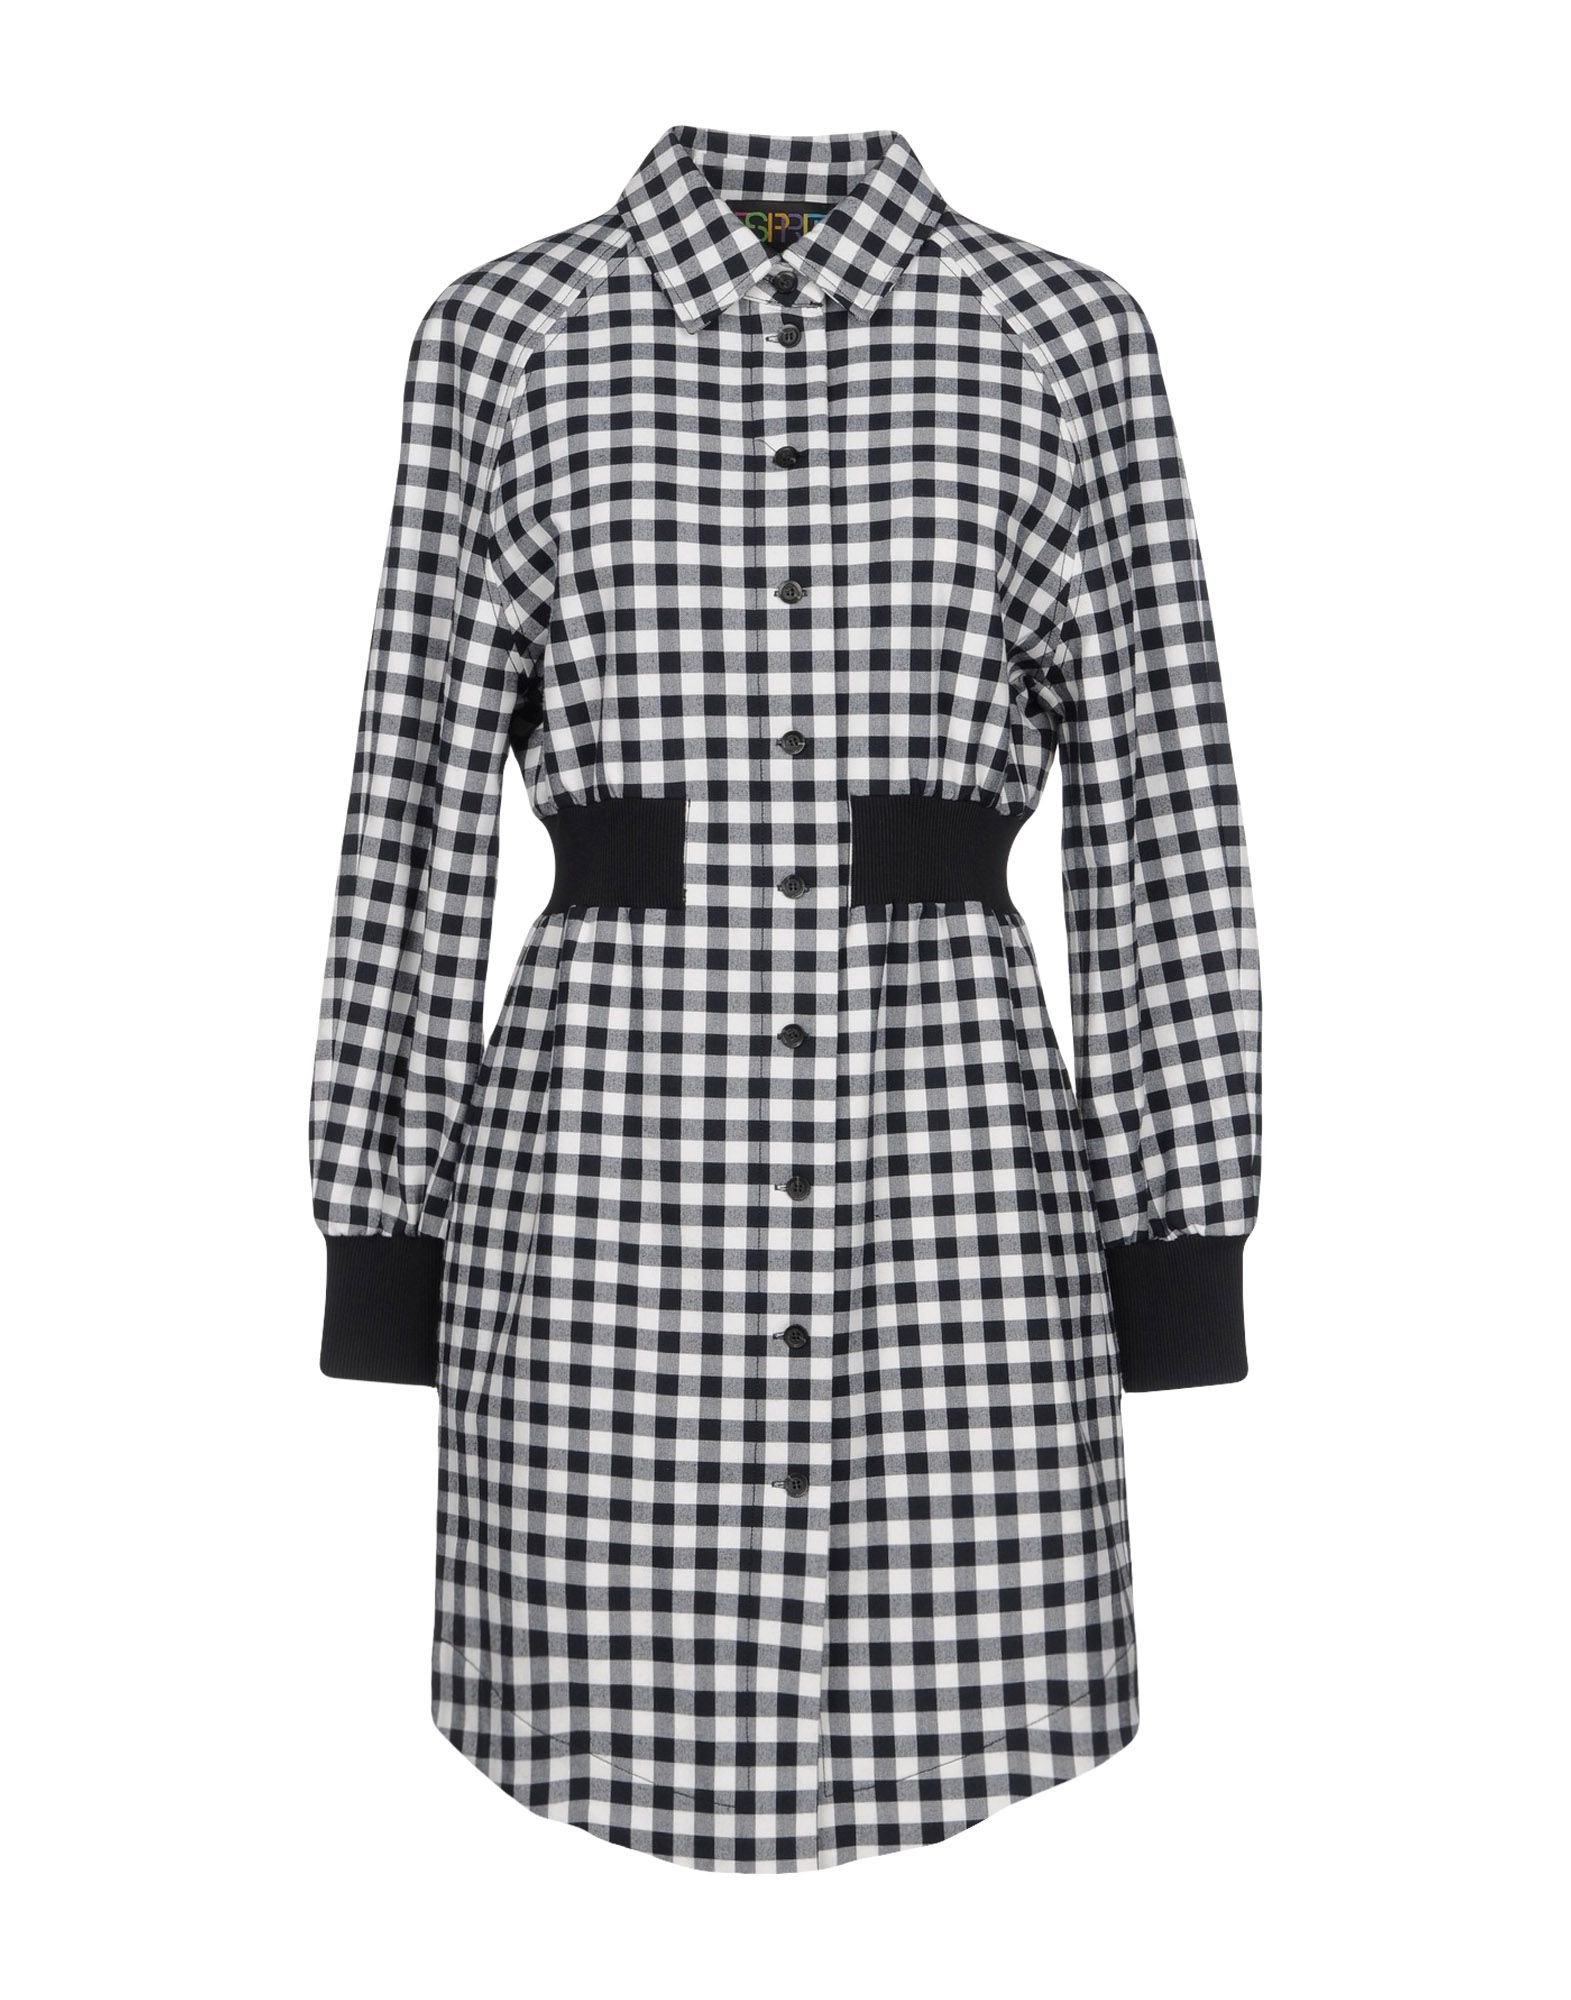 OPENING CEREMONY X ESPRIT Короткое платье безрукавка vest f06